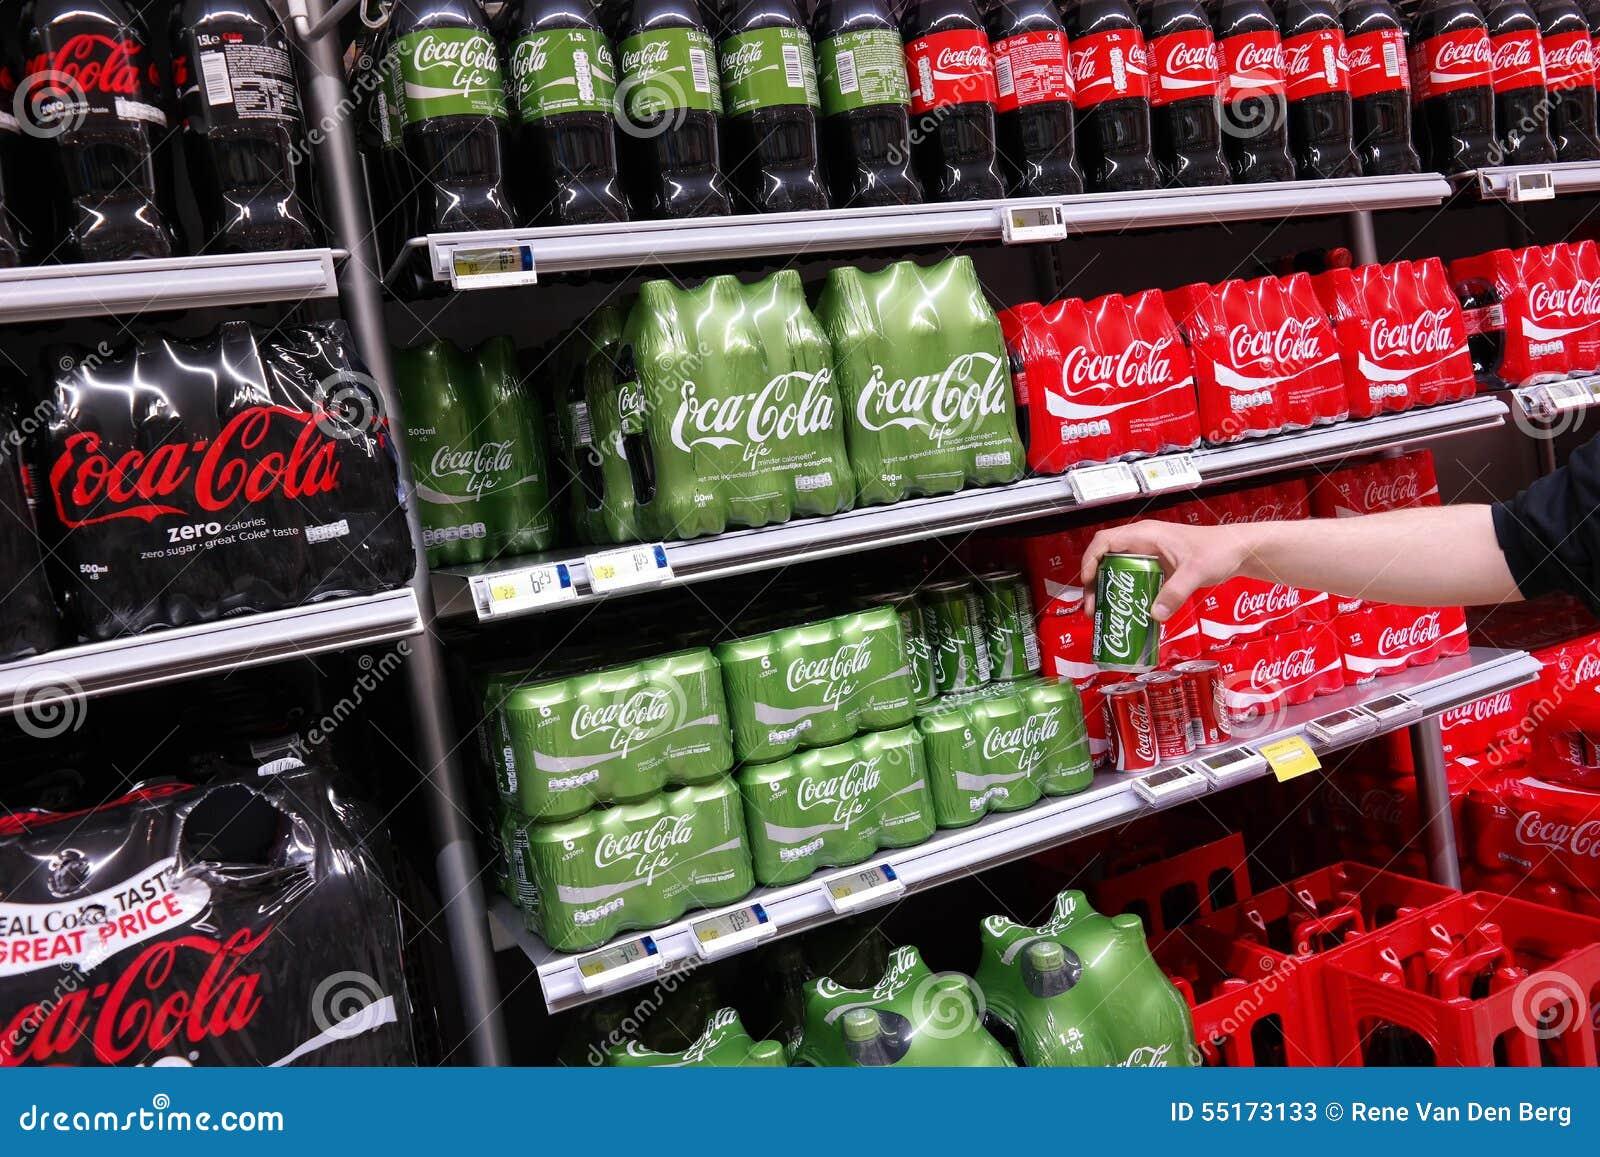 Coca-Cola's Belgian Crisis - The Public Relations Fiasco